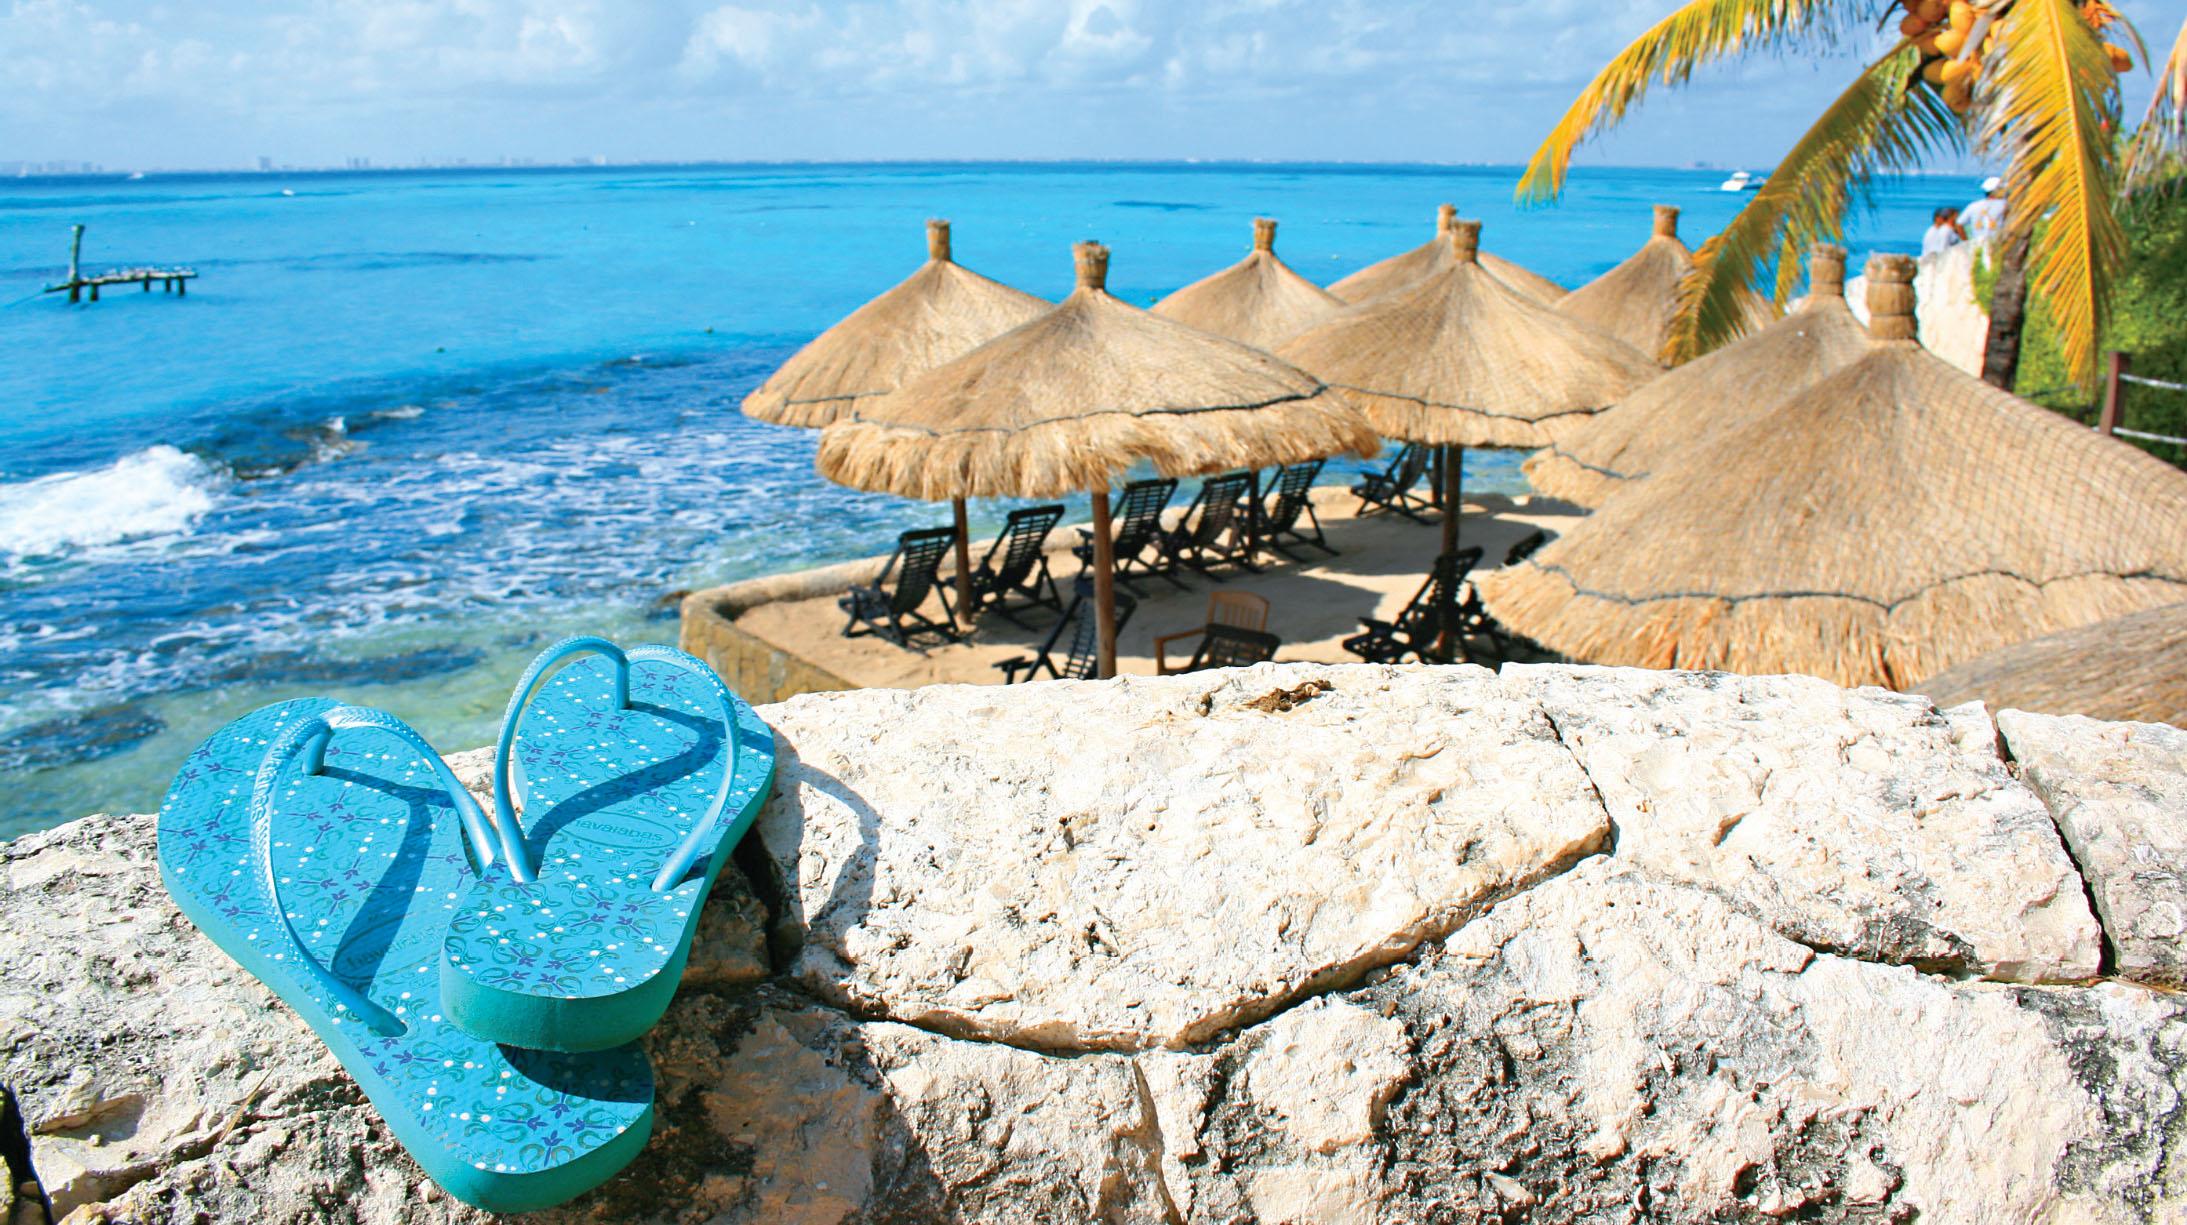 SCRAPBOOK: Isla Mujeres, em Cancún